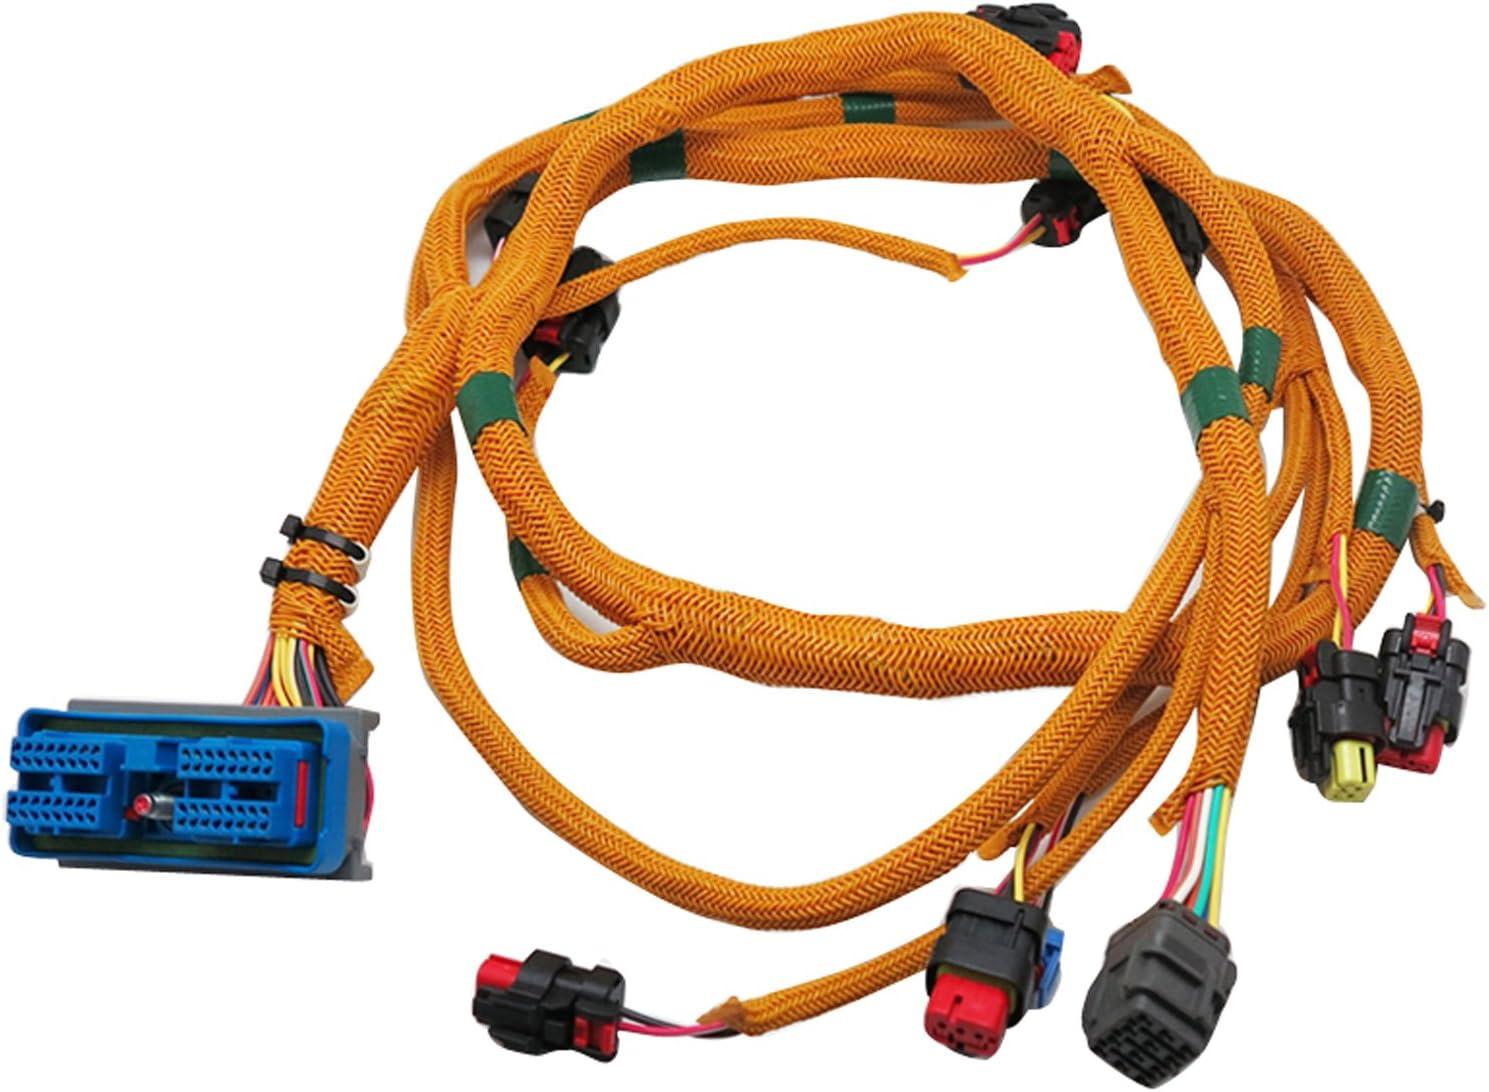 Amazon.com: E320C 170-9364 Engine Wiring Harness - SINOCMP Engine Wiring  Harness for 320C E320C Excavator Aftermarket Parts, 3 Month Warranty:  AutomotiveAmazon.com